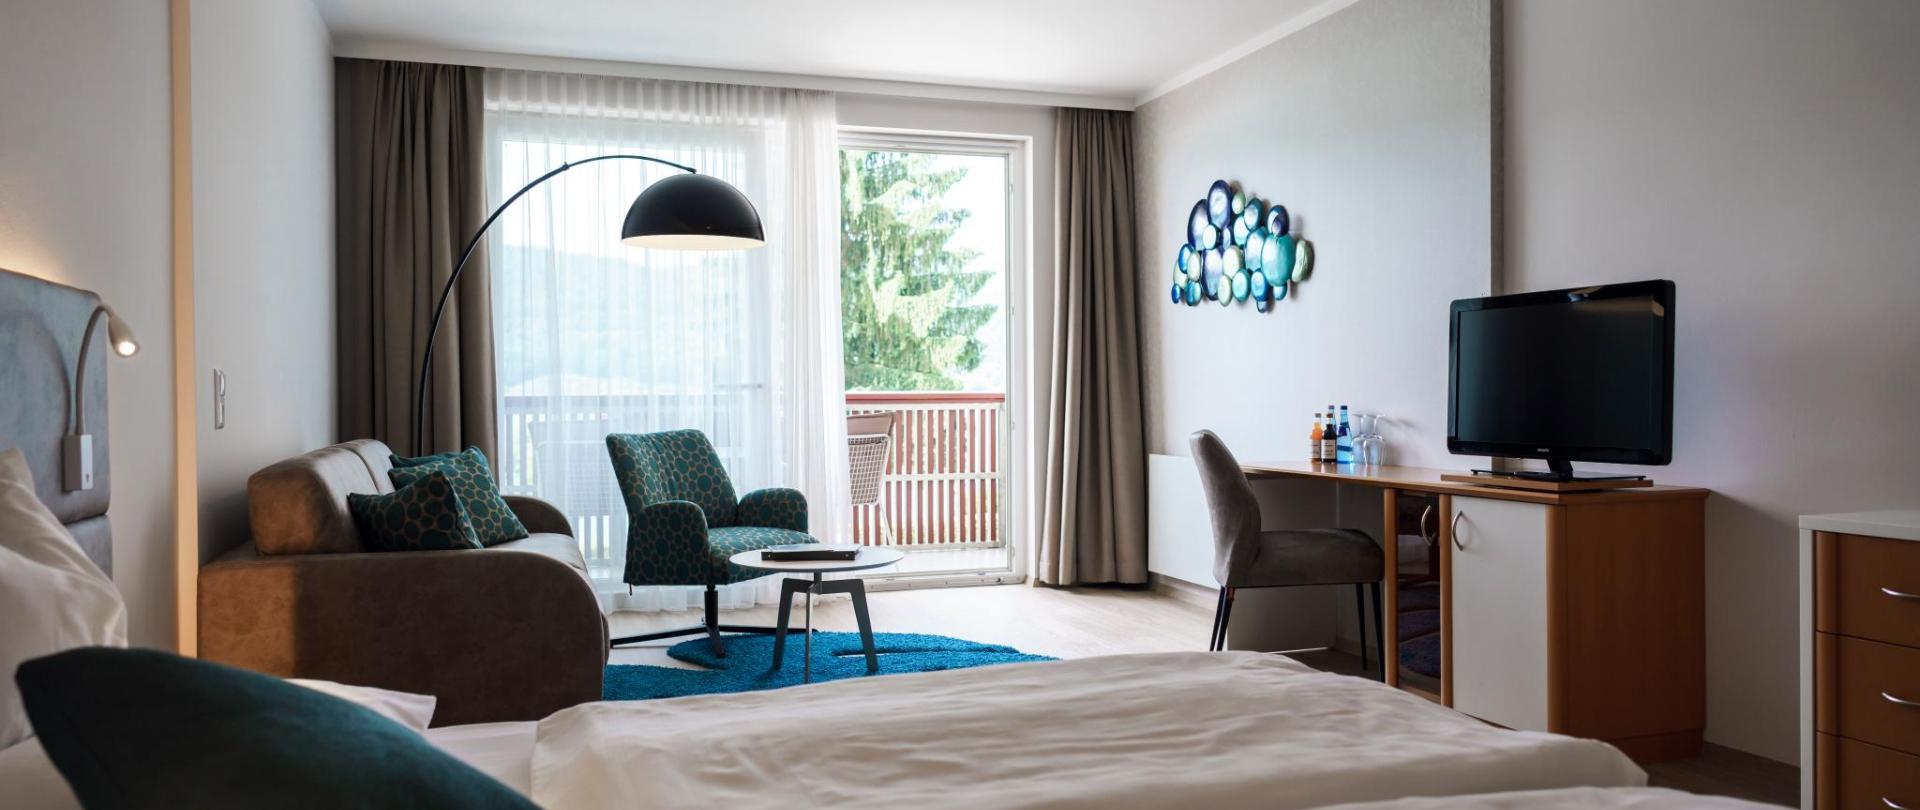 Hotel Vinzenz 2018-06-12_063.jpg